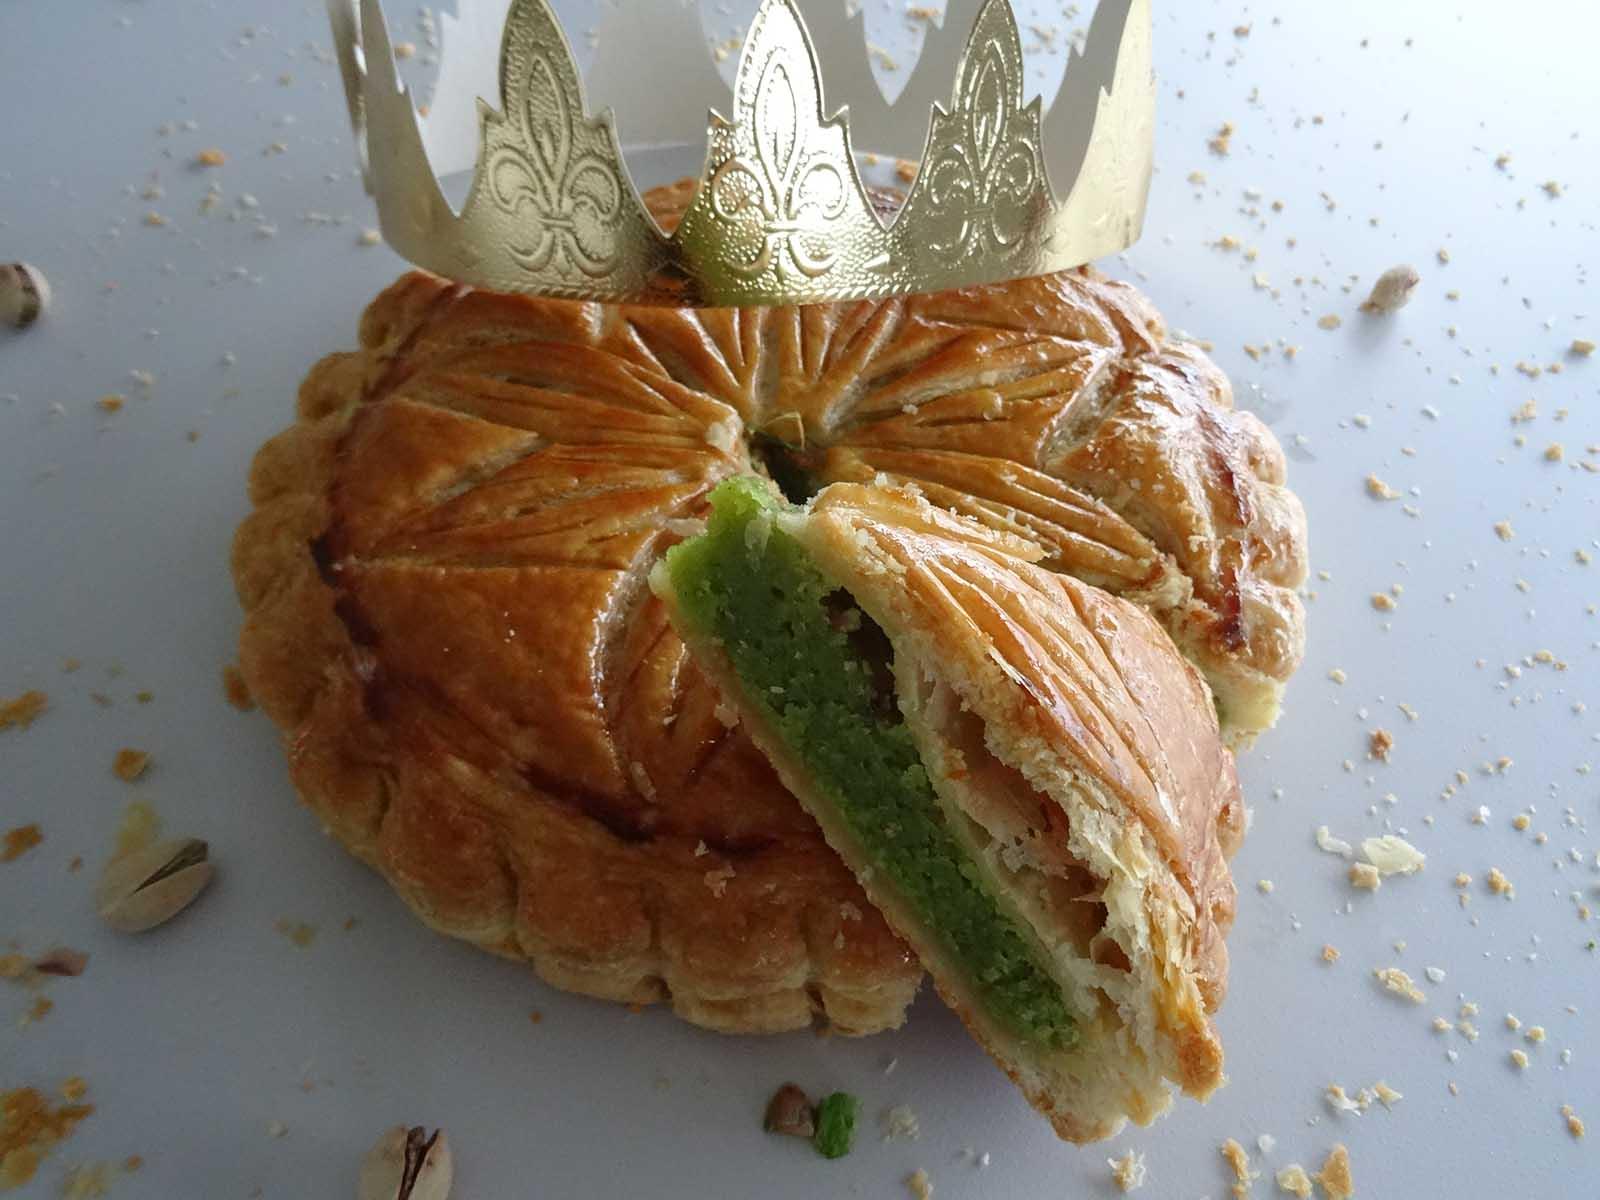 Galette des rois frangipane pistache